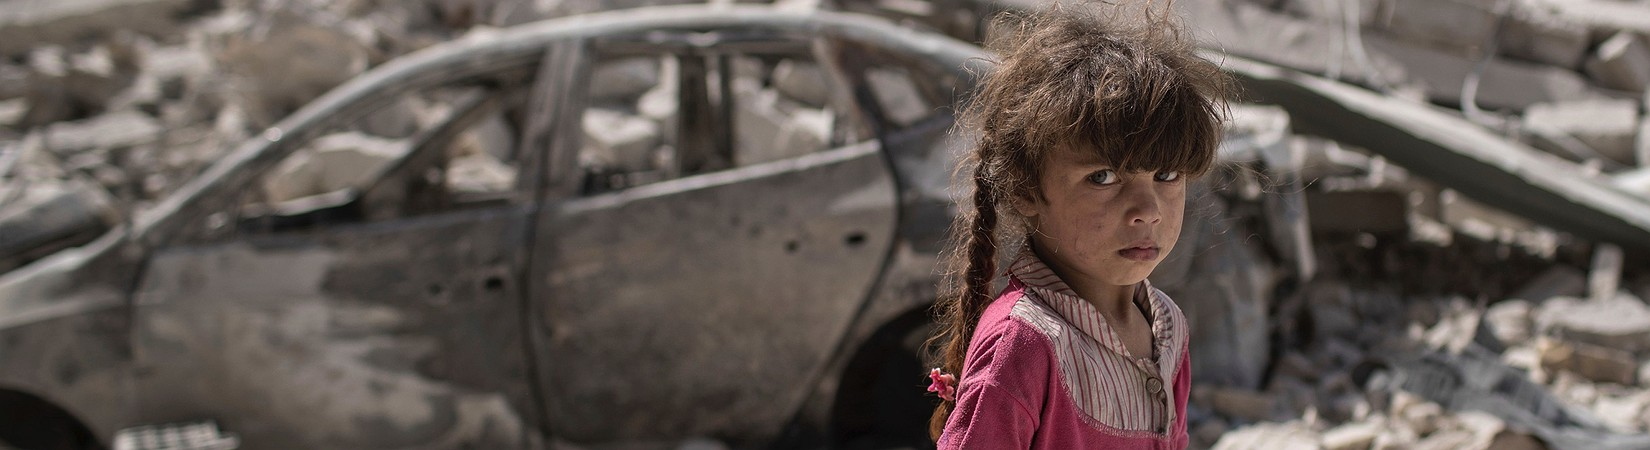 Закат ИГИЛ: Почему победа над террористами не спасет Ирак